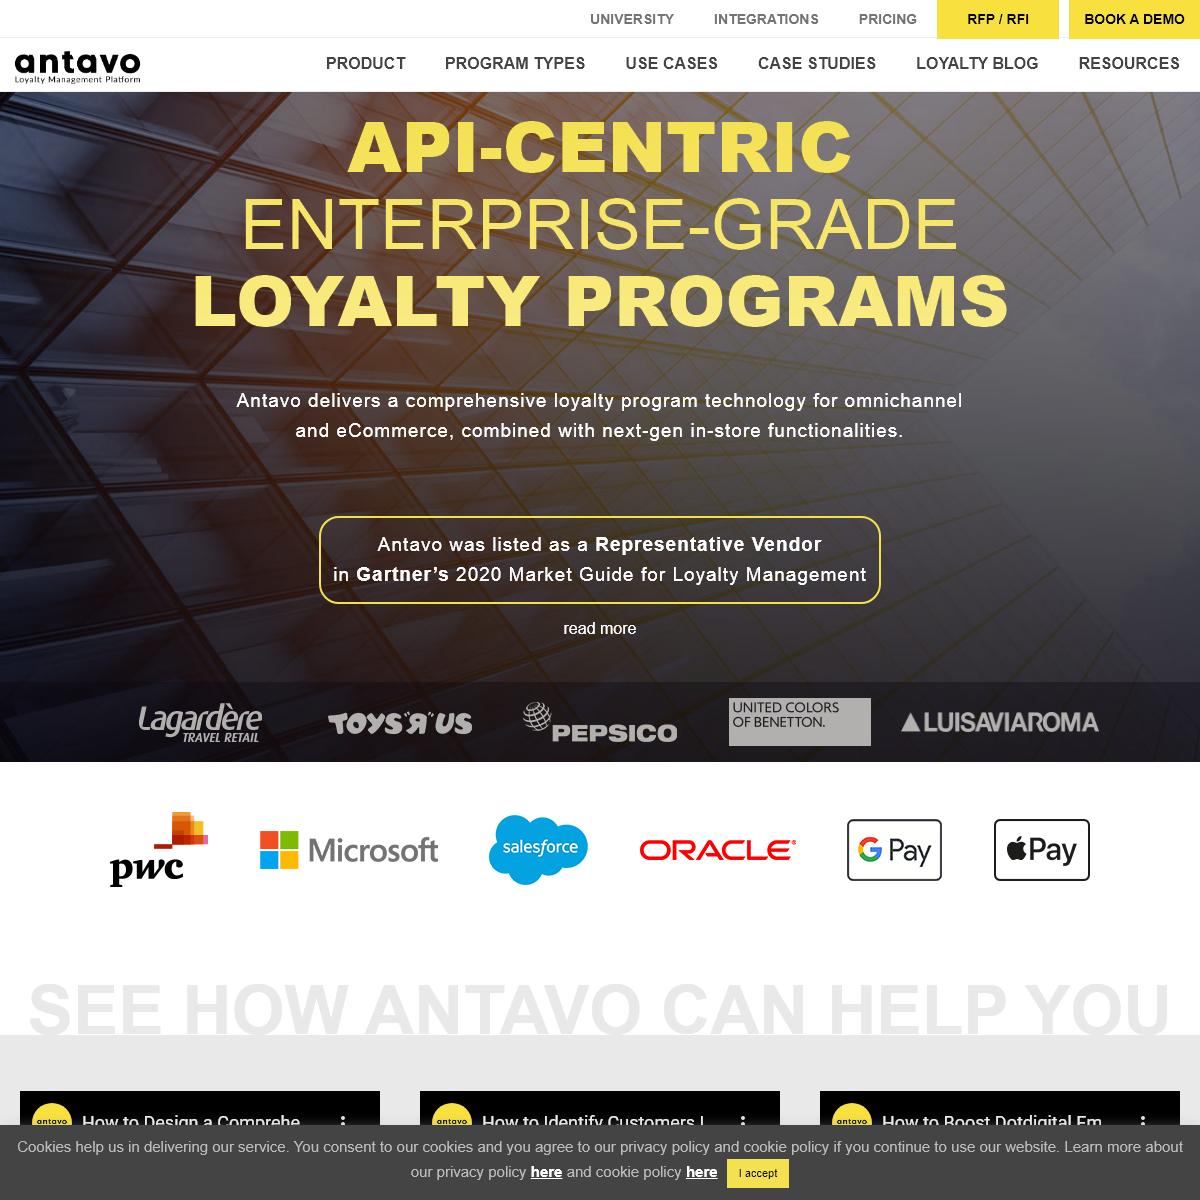 Antavo Loyalty Management Platform - Loyalty Programs for Retail - Antavo